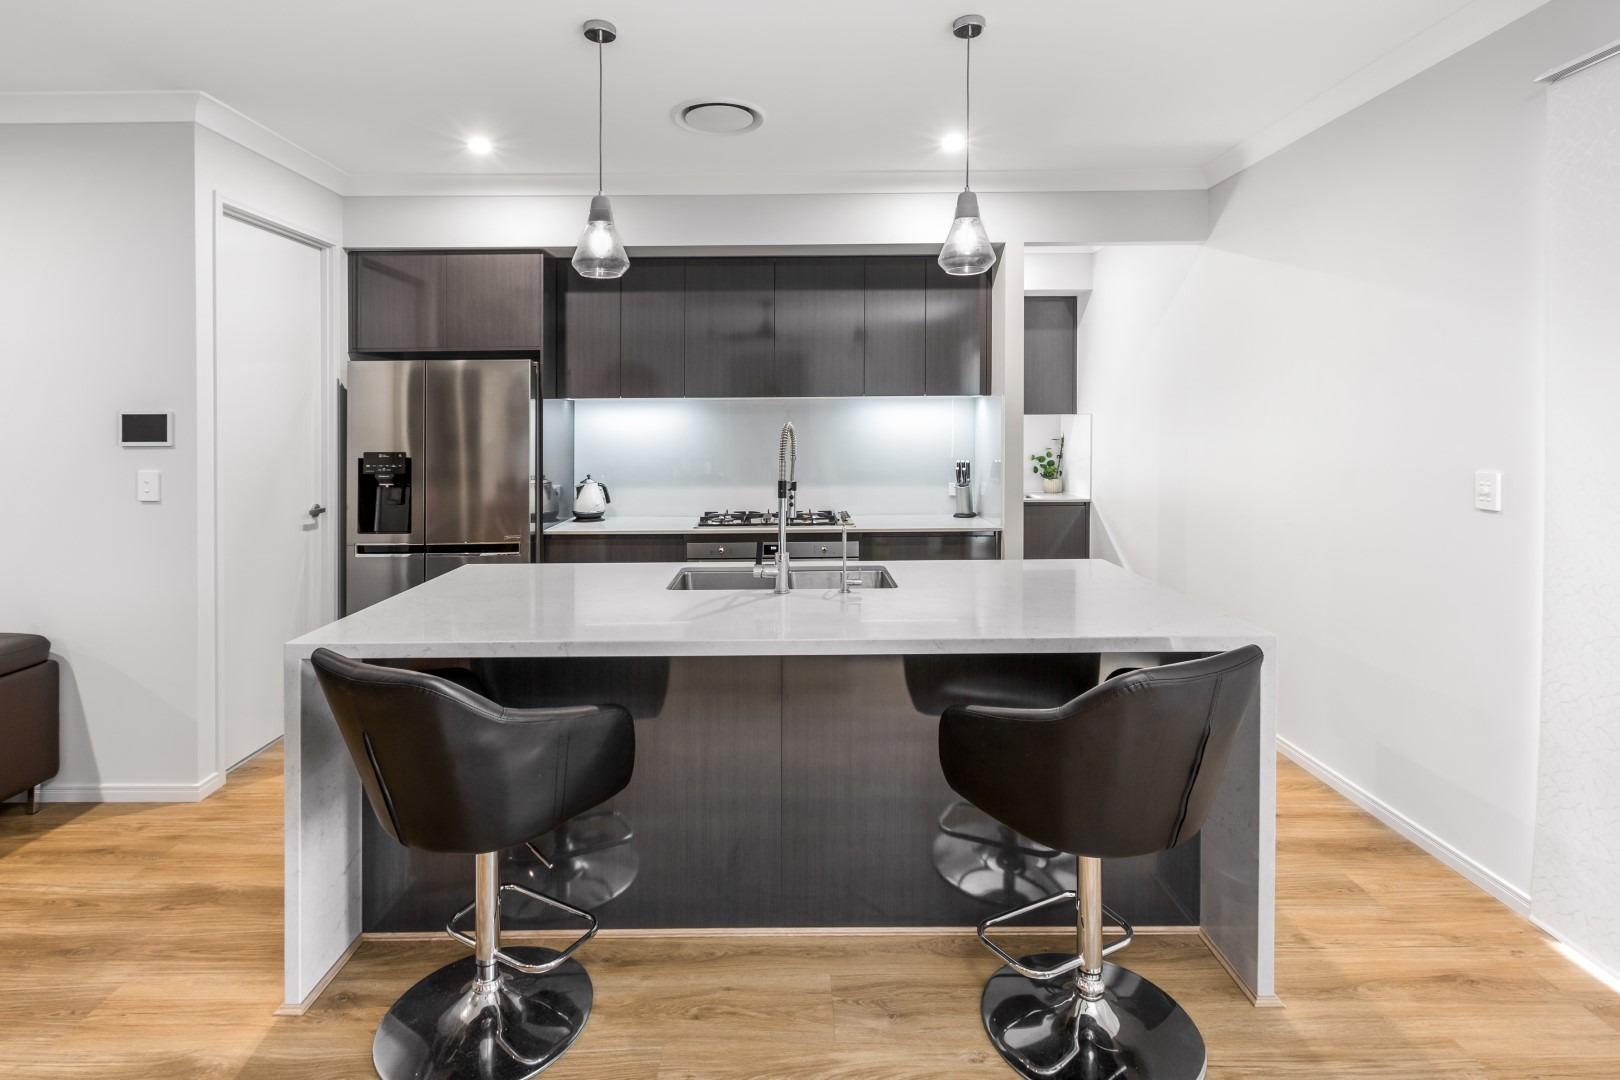 Kitchen_remodBathroom Renovation Specialist in Ipswich eling_company_McColl_Cabinetmakers